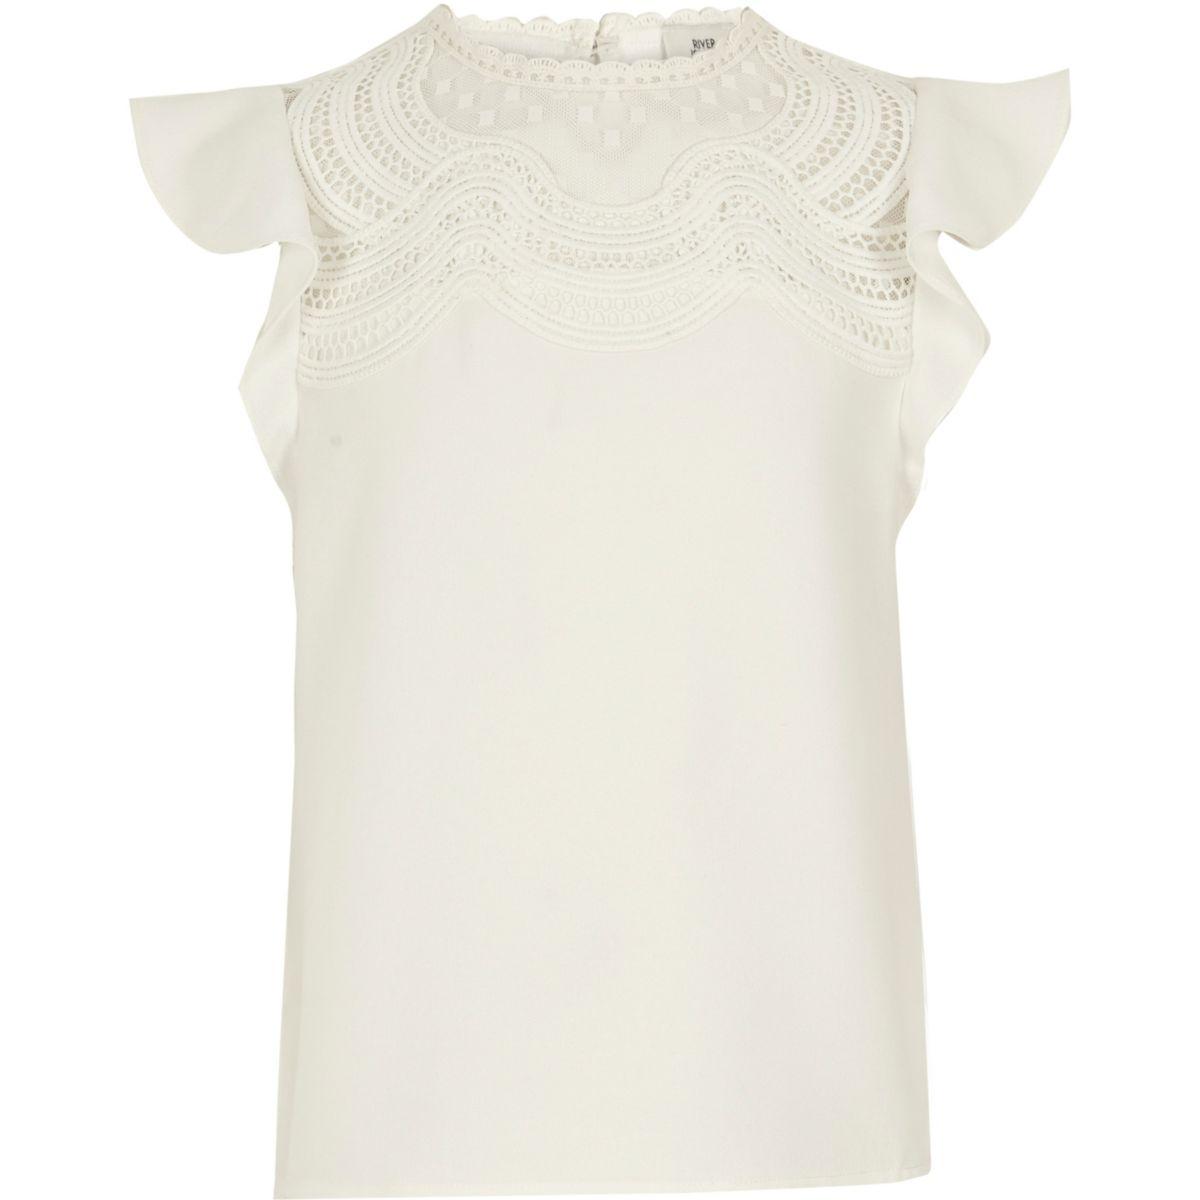 Girls white crochet lace yoke top